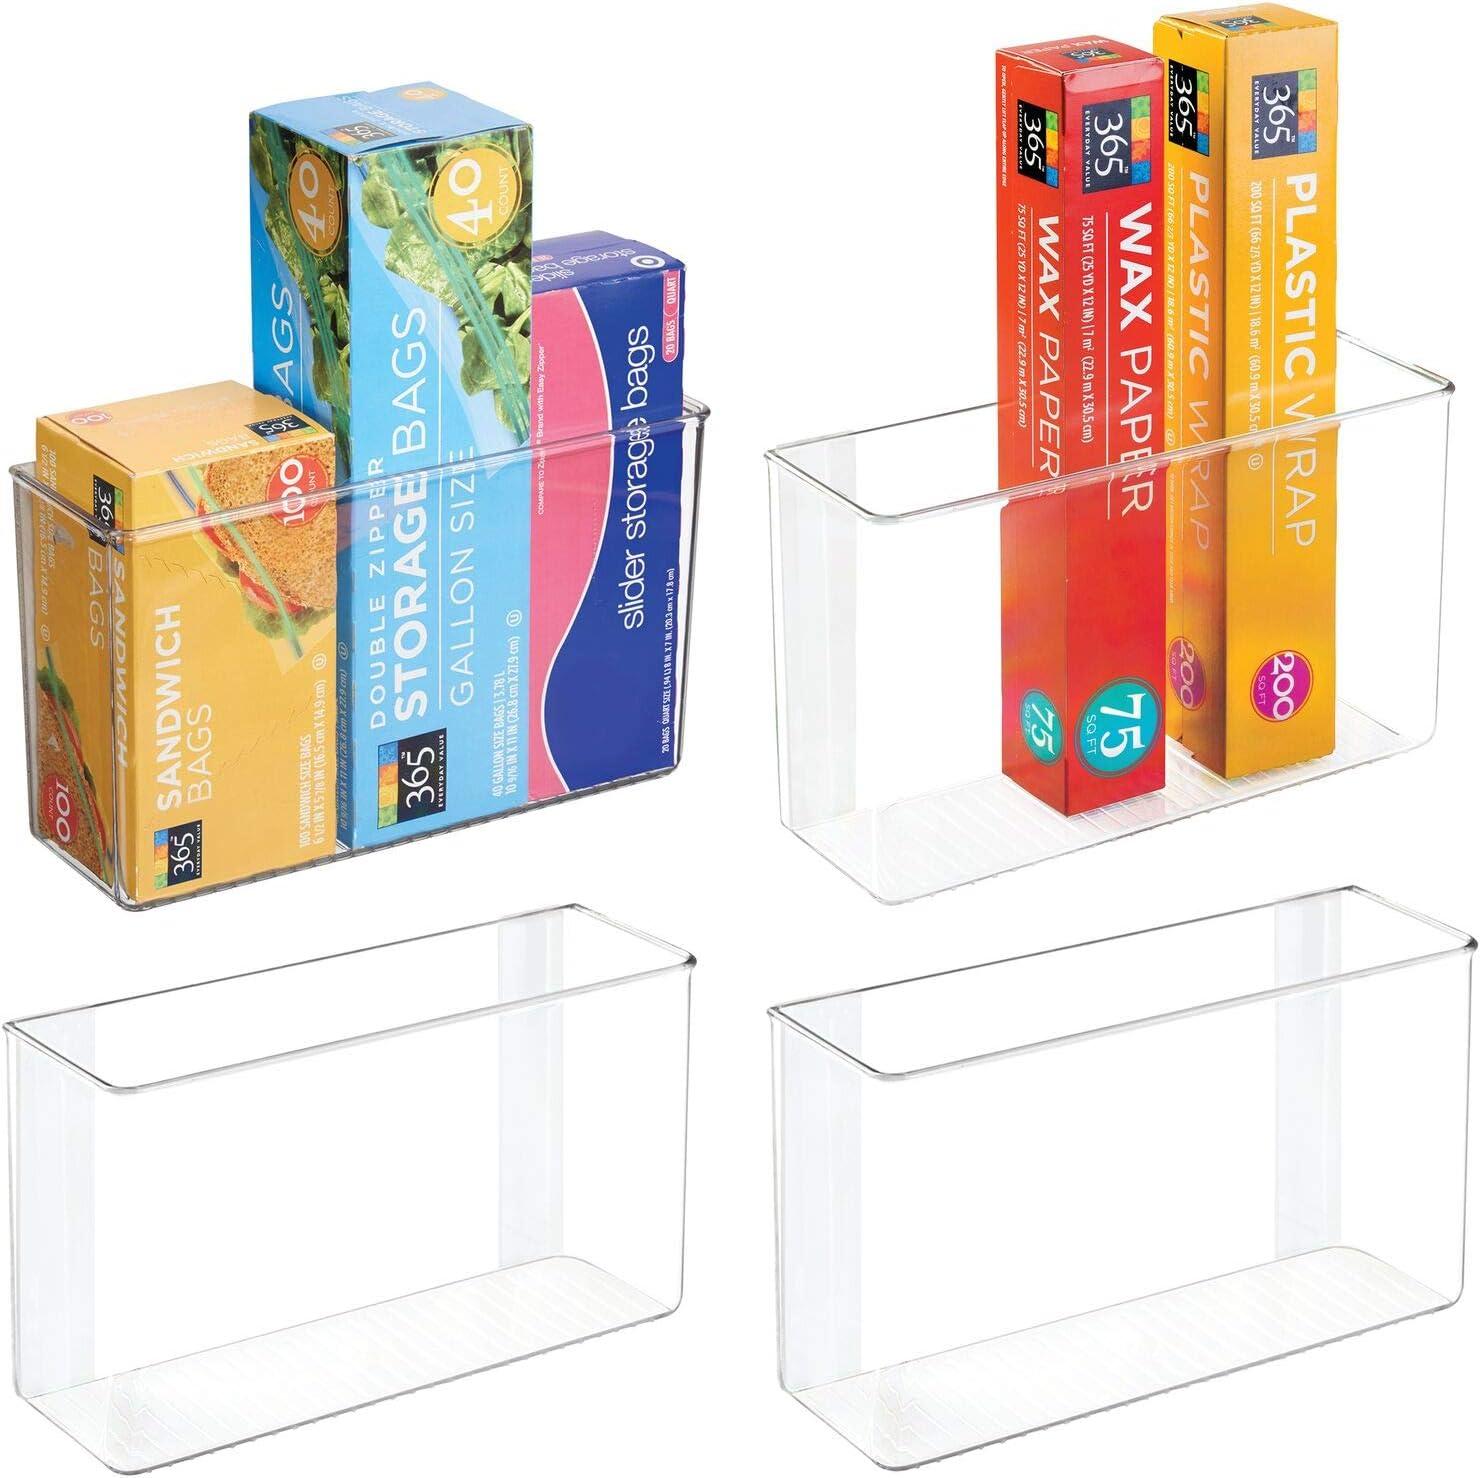 mDesign latest Plastic Columbus Mall Adhesive Storage Organizer Kit for Container Bin